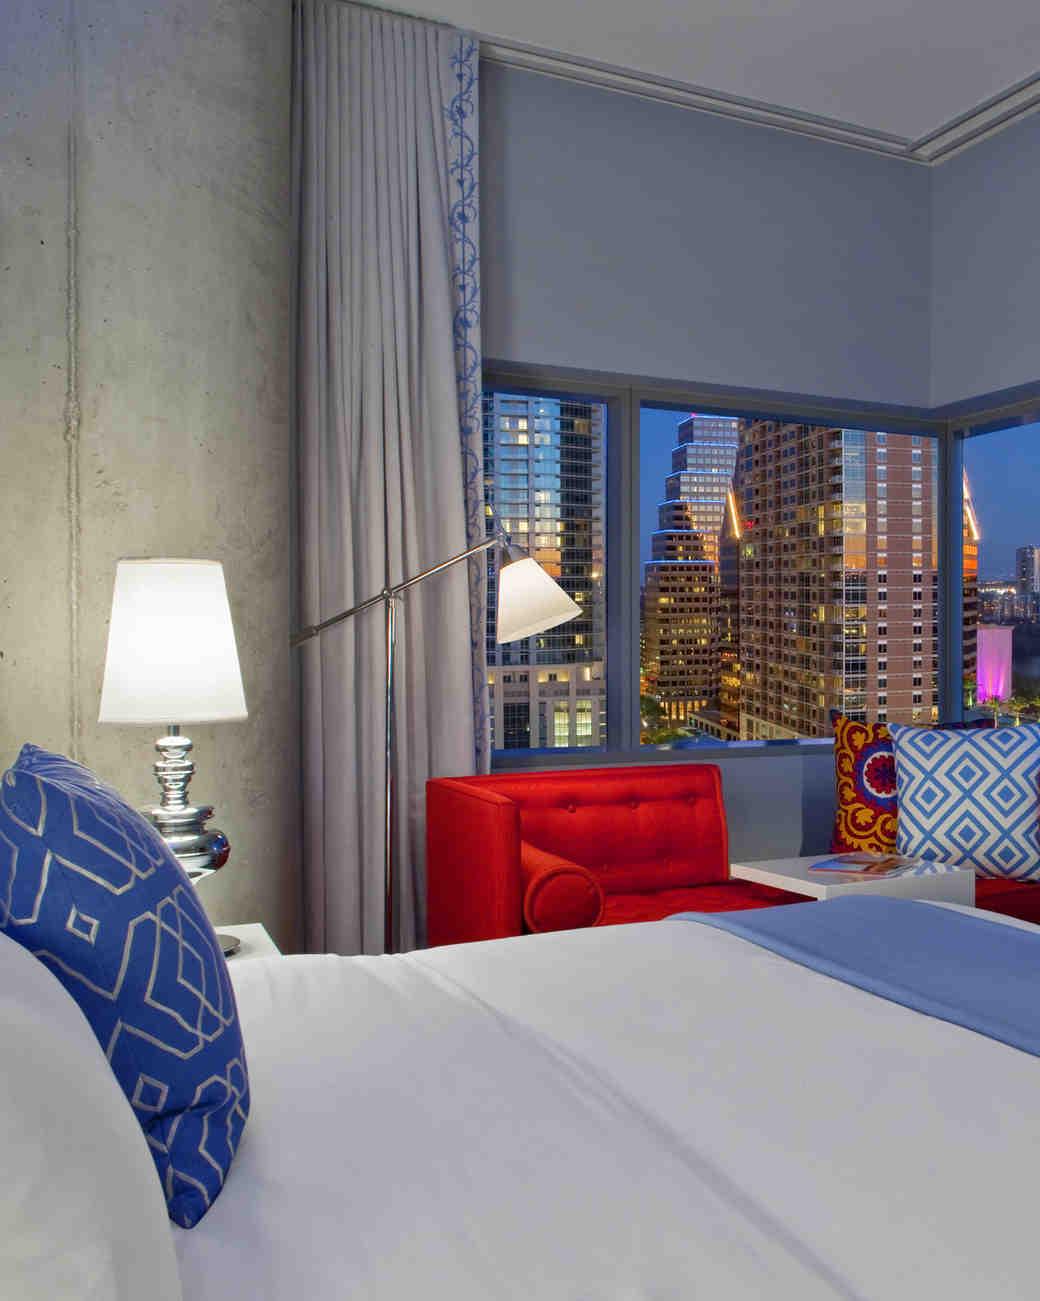 W Hotel room Austin, Texas